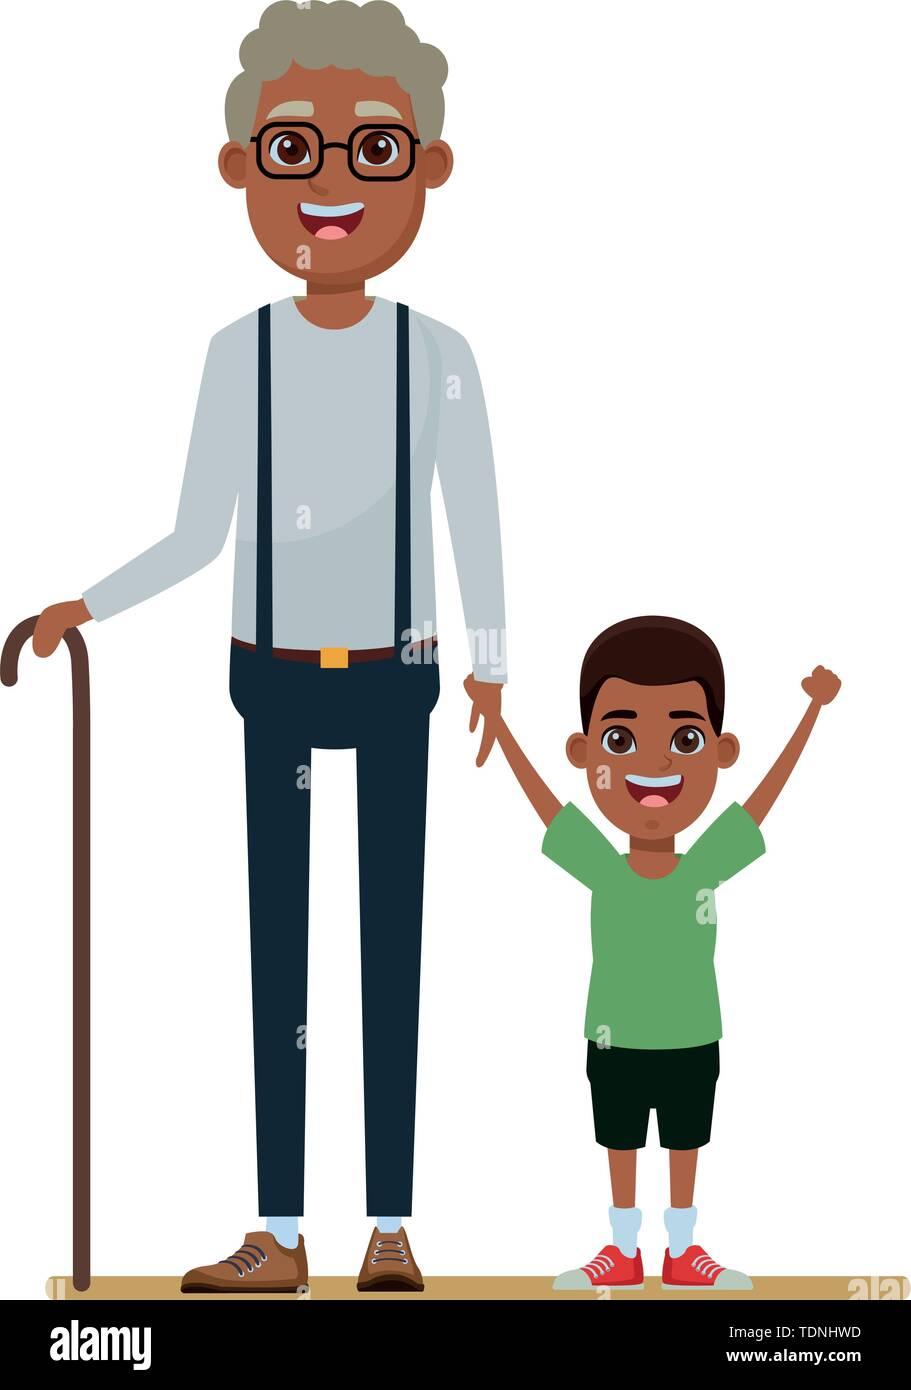 Familie avatar afroamerican Großvater mit glasse und Zuckerrohr Neben afroamerican junge Profil Bild Cartoon Character portrait Vektor-illustration gr Stockbild